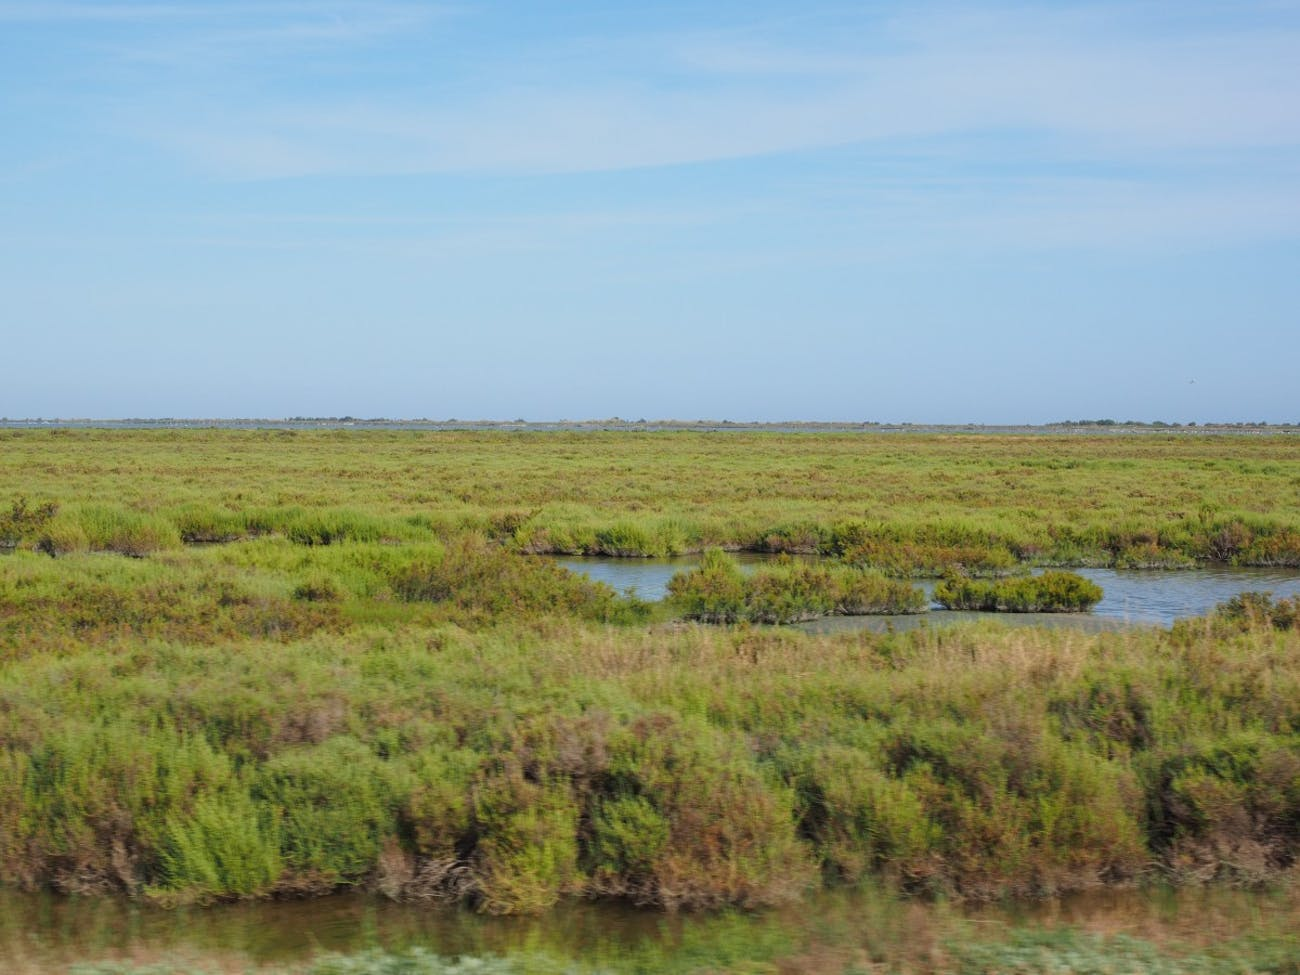 marsh, saltwater, climate